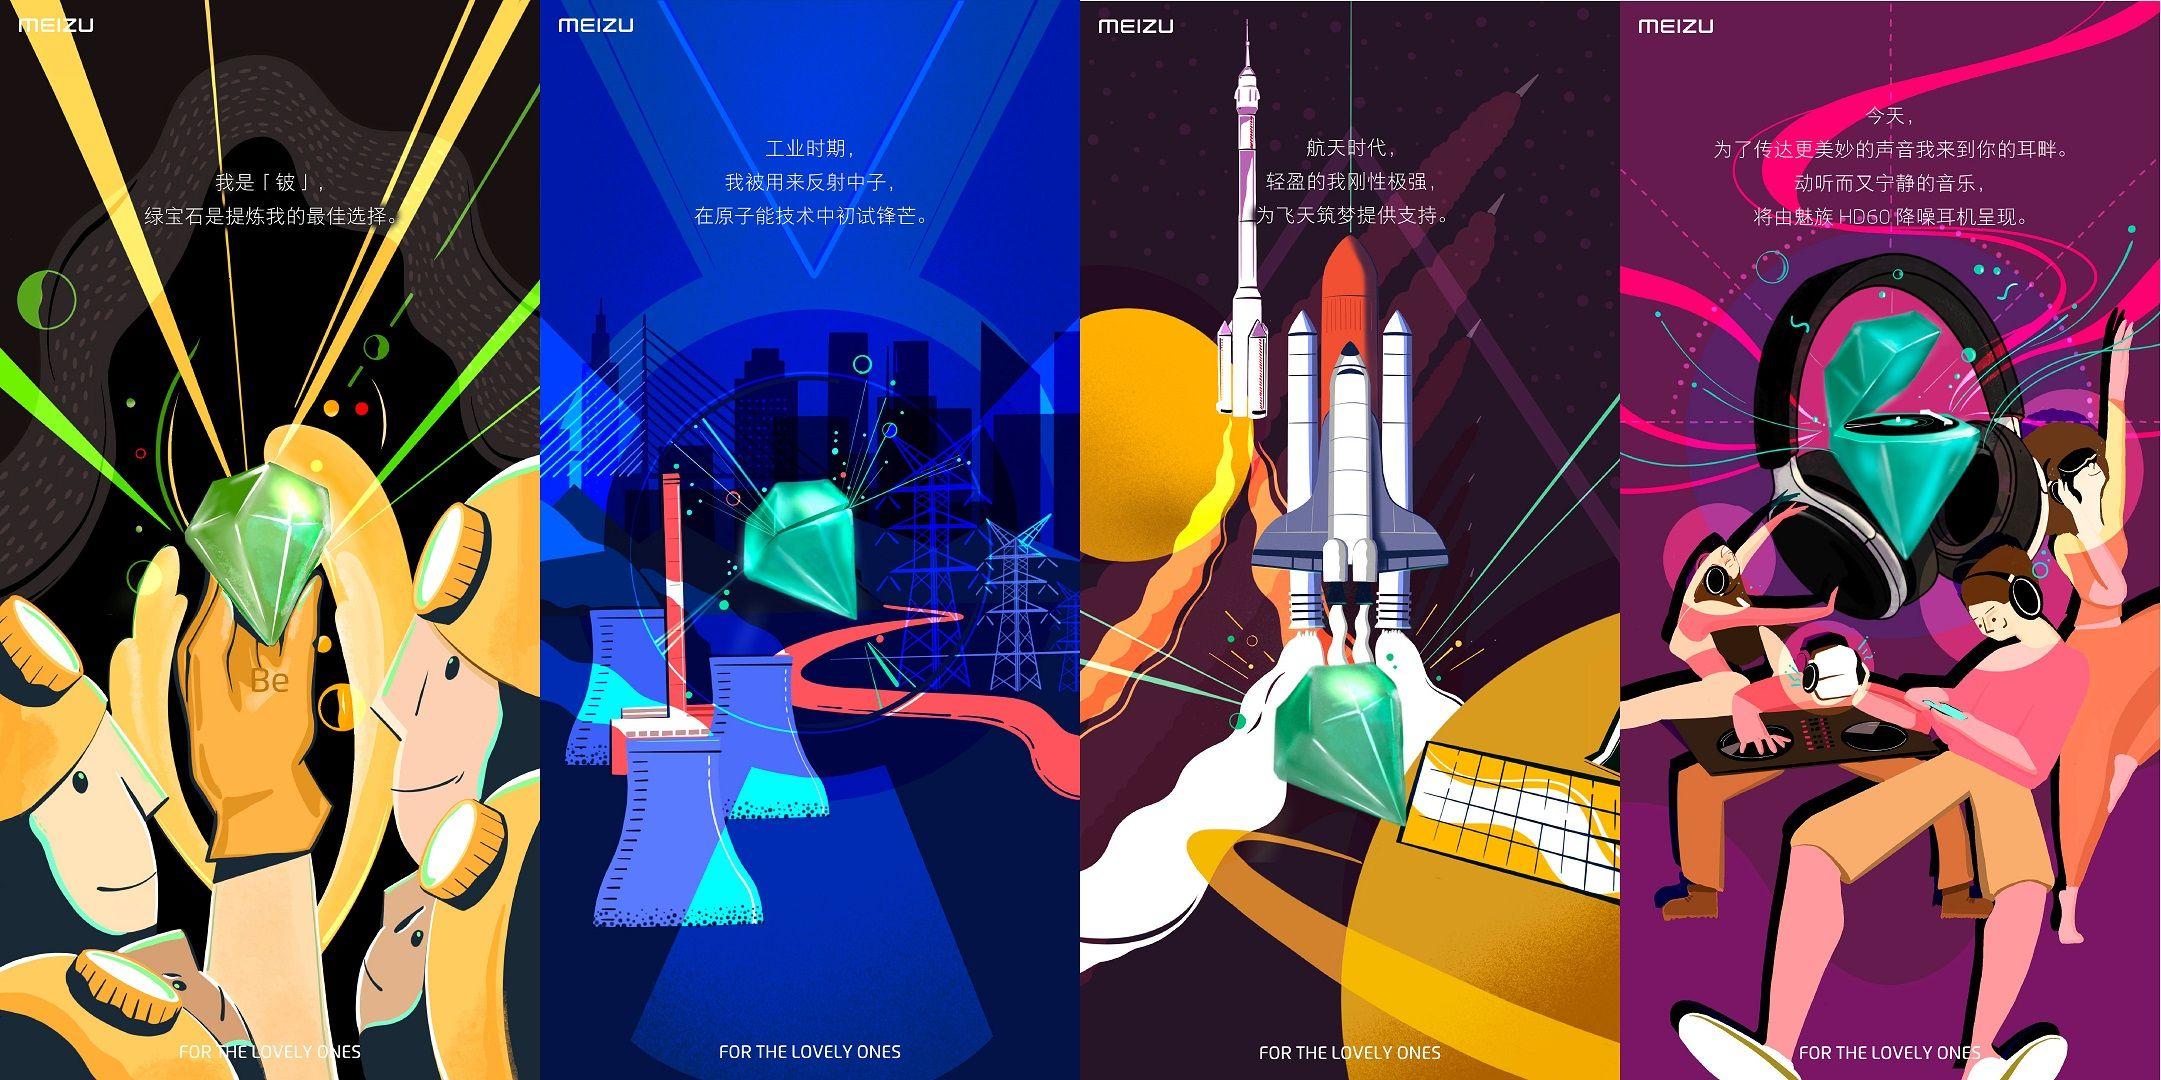 Meizuが新アクセサリーとしてMeizu HD60 ANC、GaN(窒素ガリウム)充電器の発表を予告